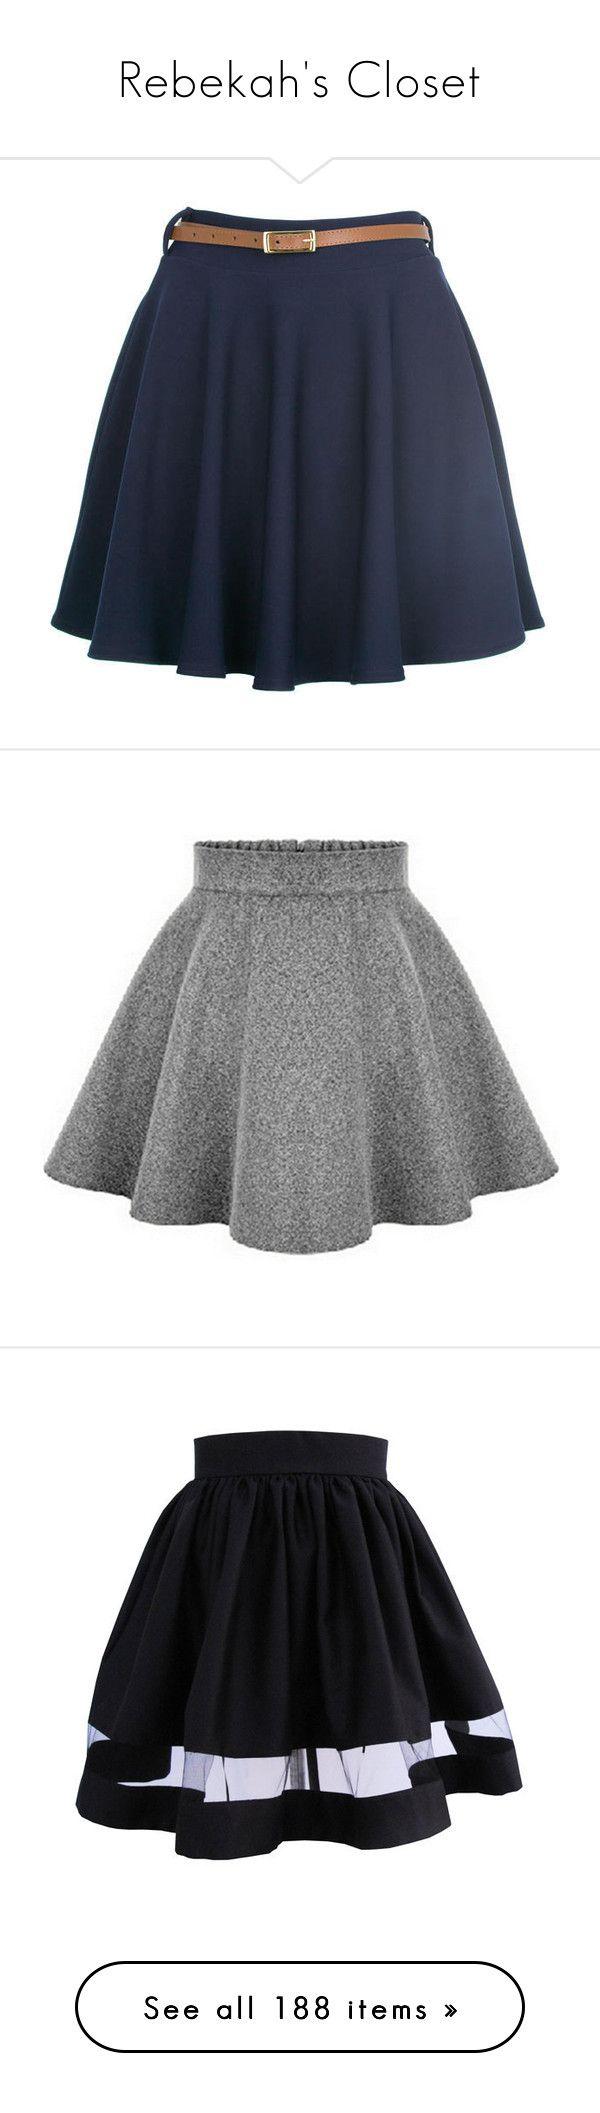 """Rebekah's Closet"" by booknerd7 ❤ liked on Polyvore featuring skirts, mini skirts, bottoms, saias, faldas, army skirt, military skirt, burgundy skirt, gray skater skirt and circle skirt"